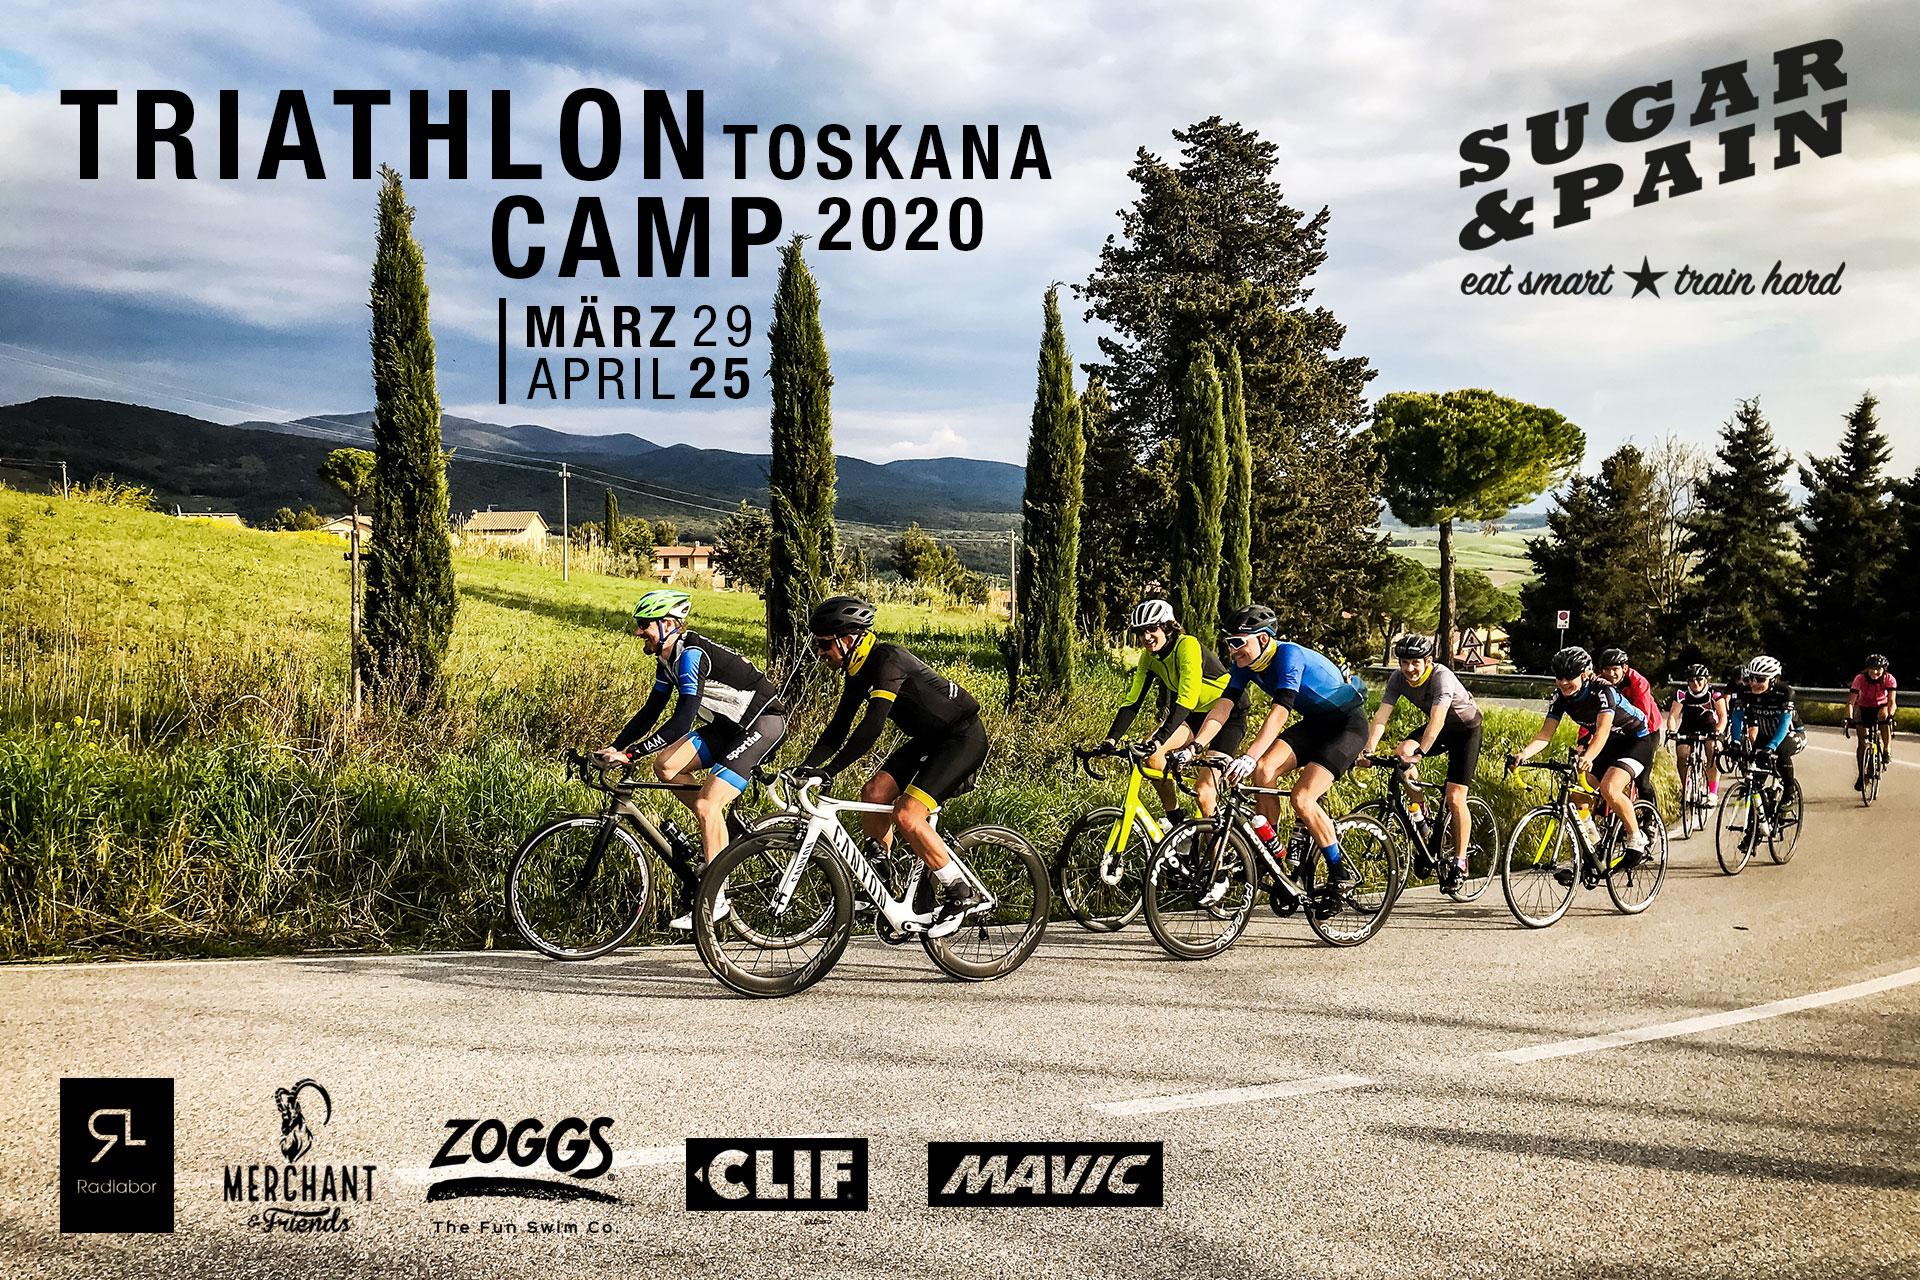 SUGAR & PAIN TRI CAMP TOSKANA – Das Triathlon Traningslager 2020 / Il Gruppo © Simon Drexl